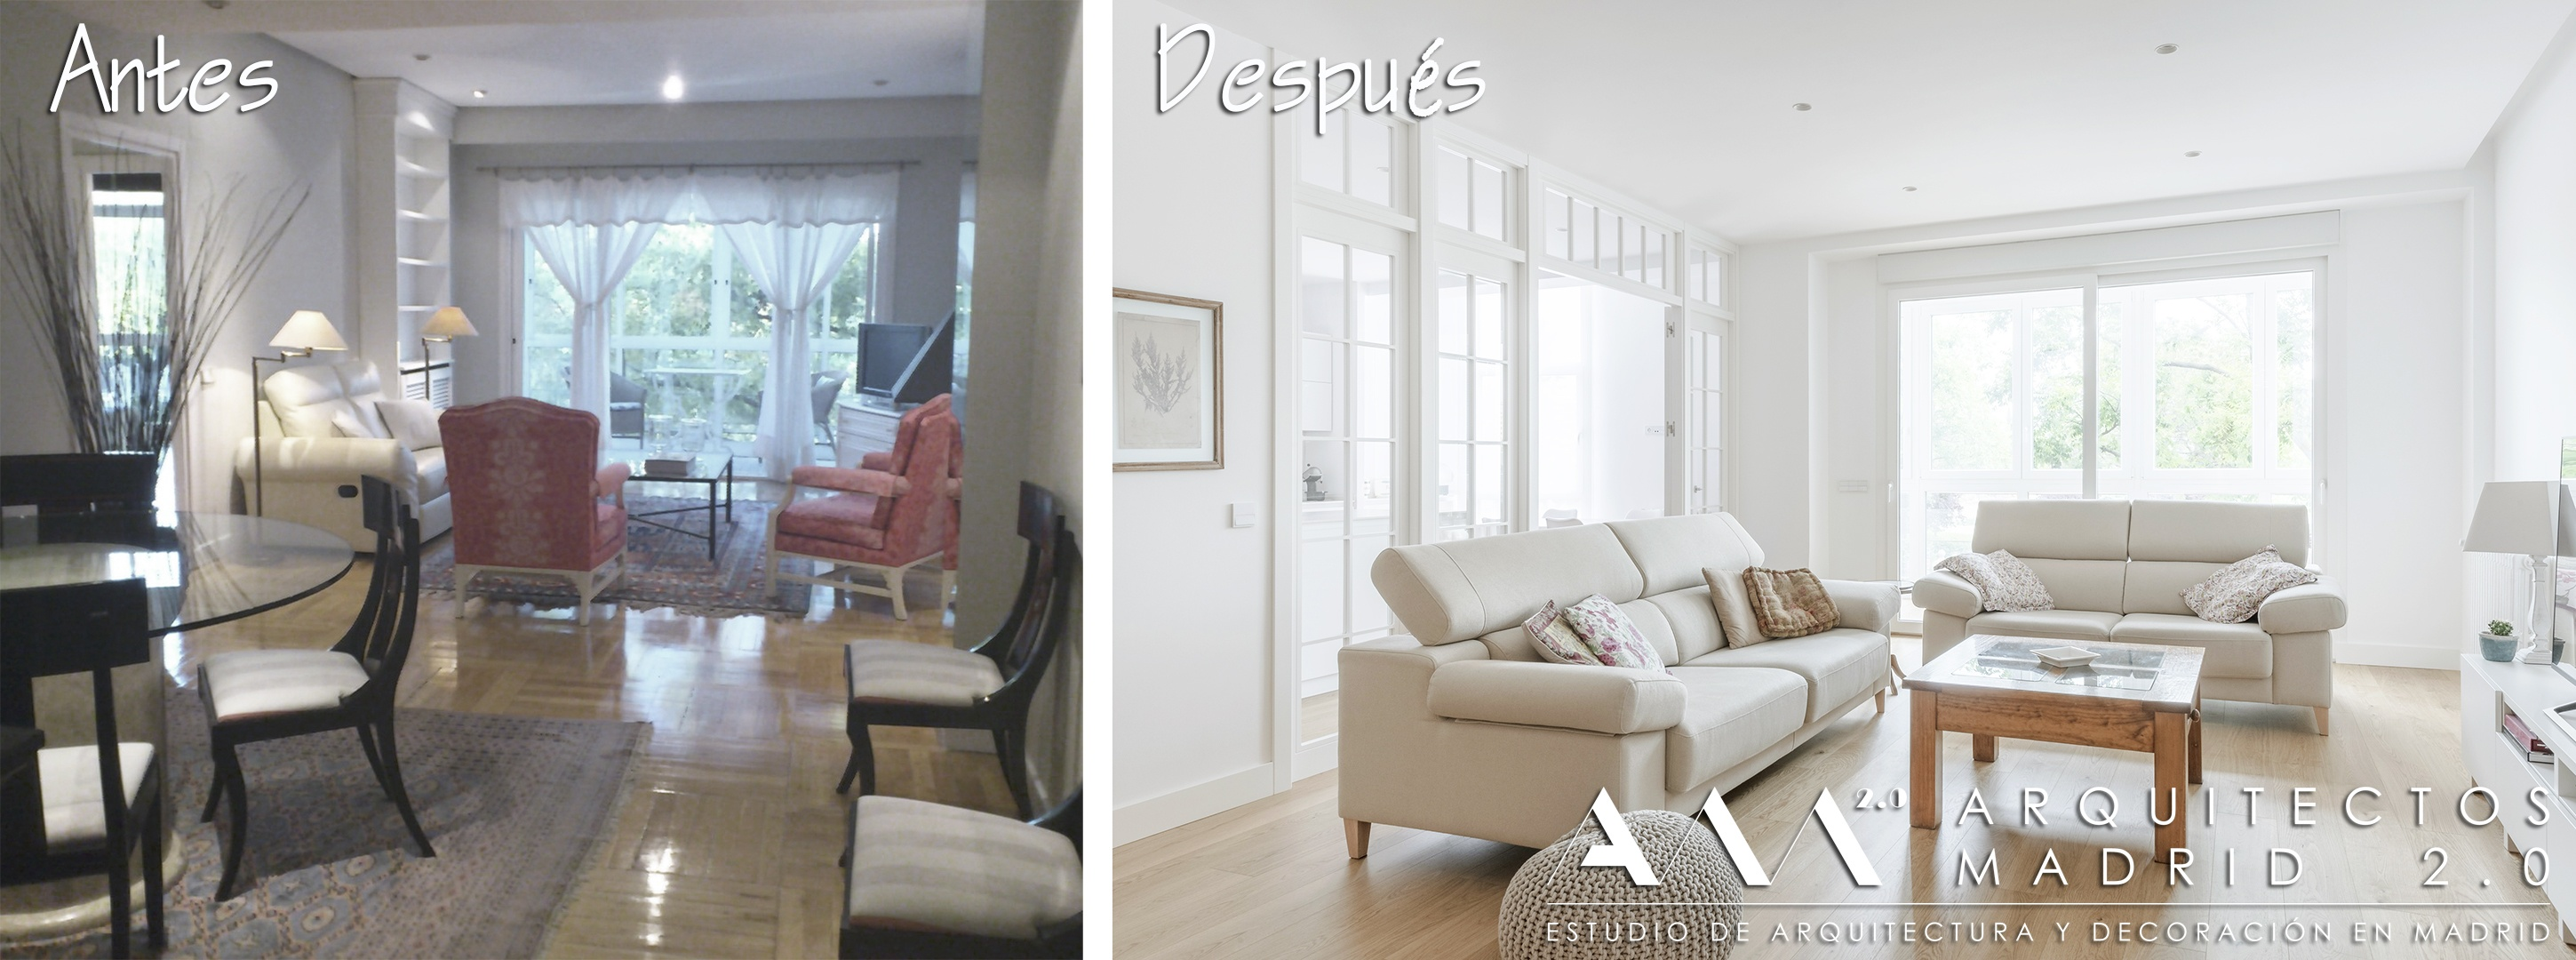 ideas-decoracion-hogar-housing-reform-home-interior-design-architects-madrid-before-after-01